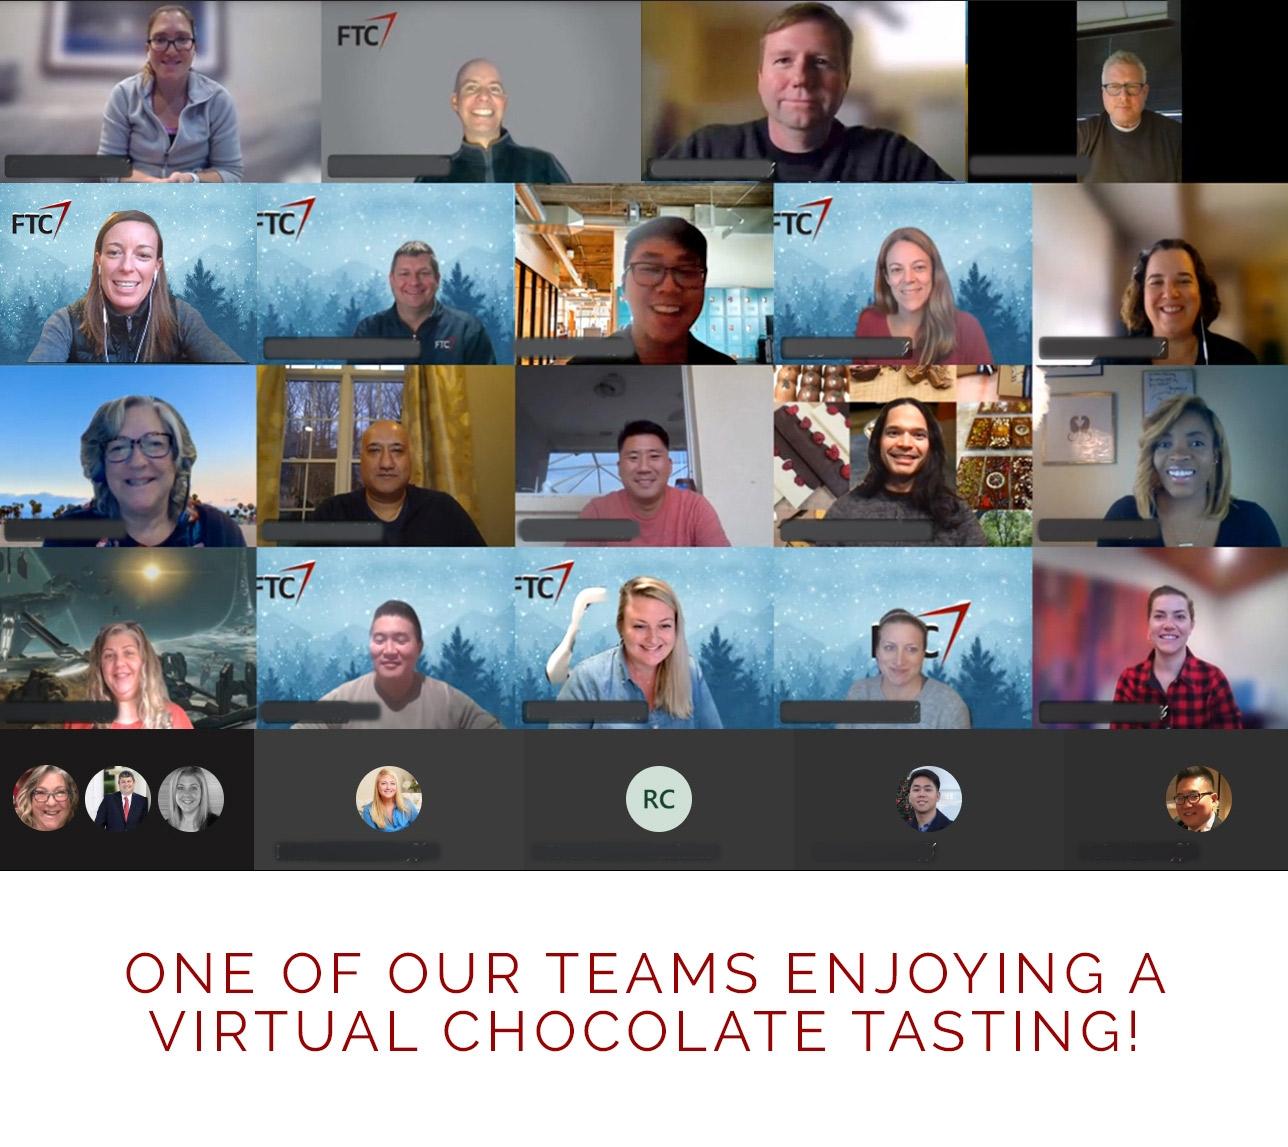 Our team enjoying a virtual chocolate tasting!